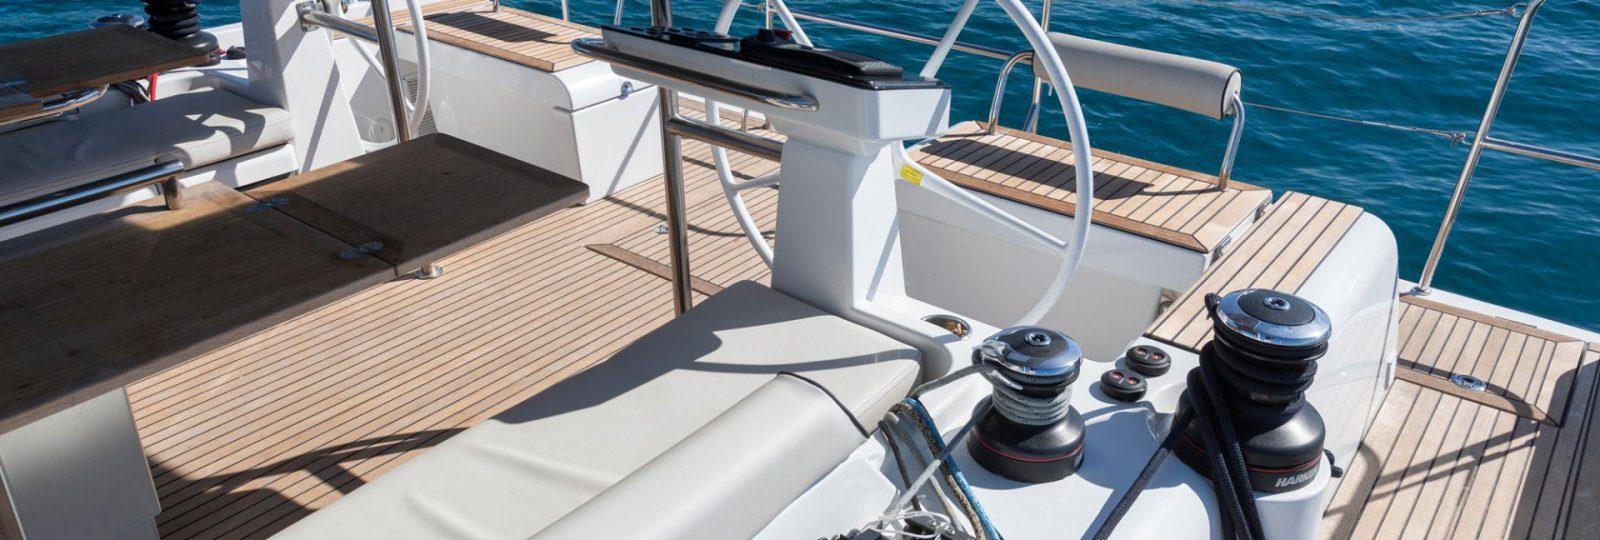 Oceanis Yacht 54 helm